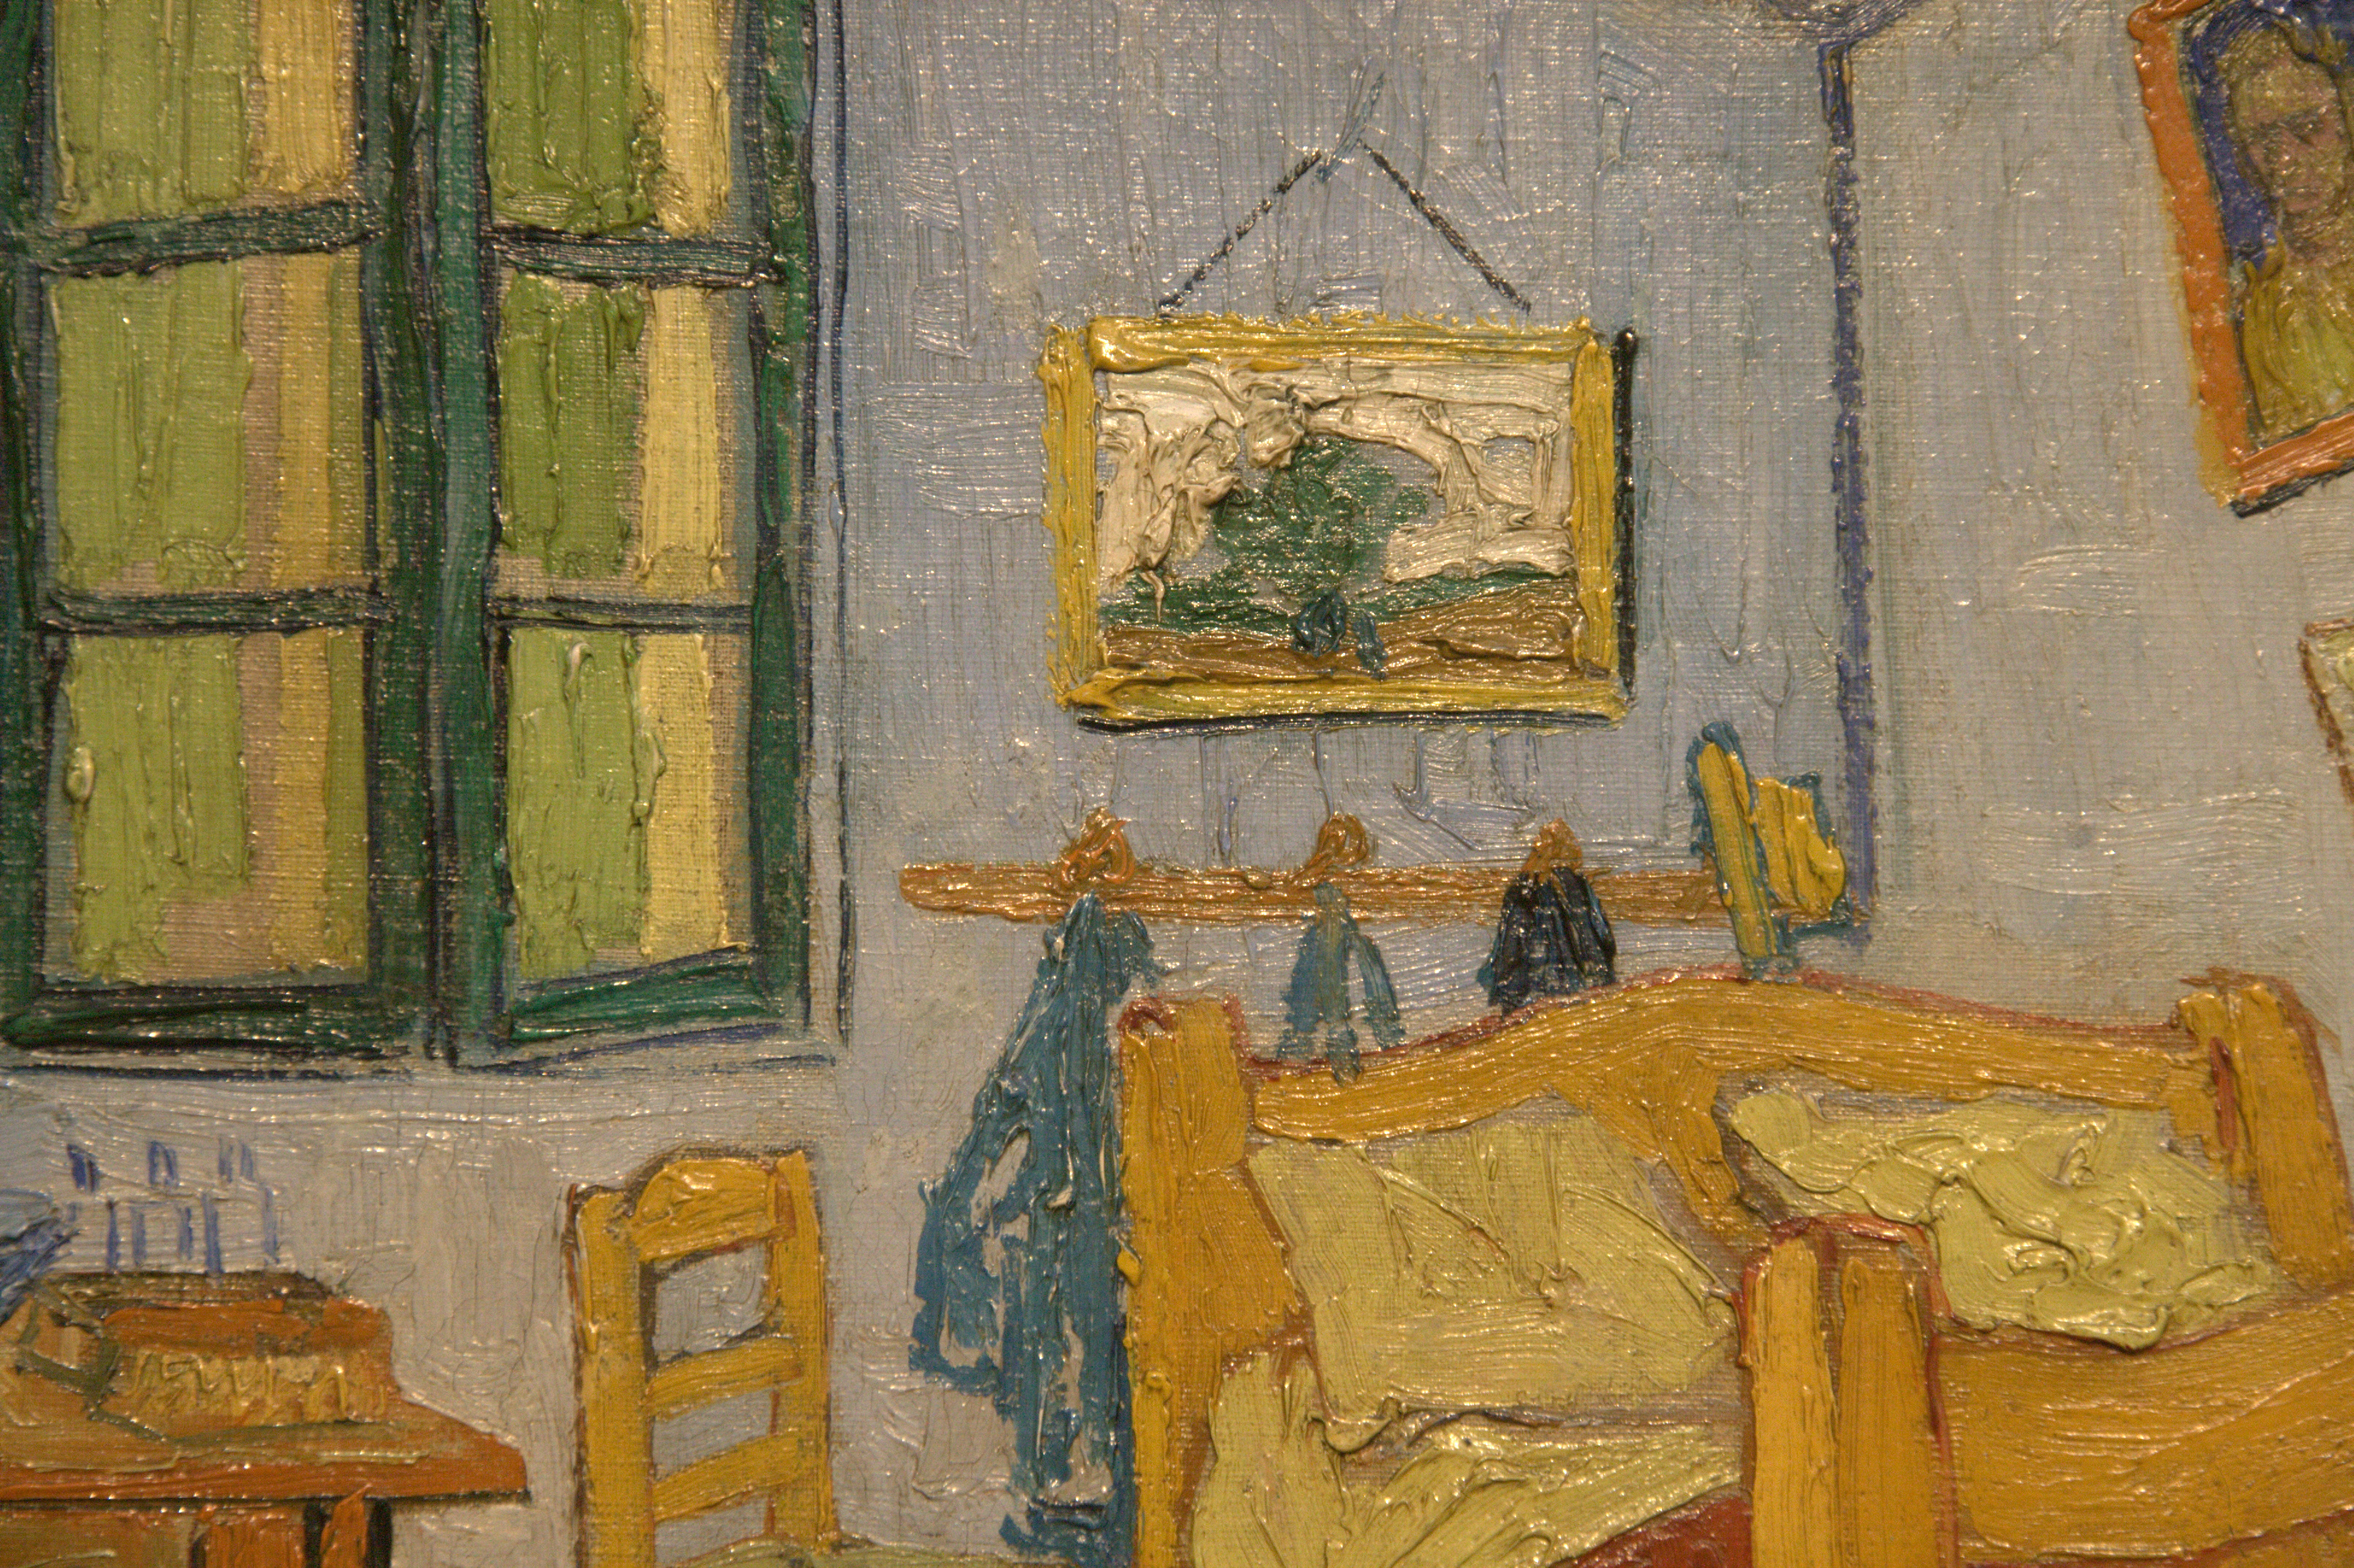 File:WLANL - ronkerkhoven - De slaapkamer (detail 1). Vincent van ...